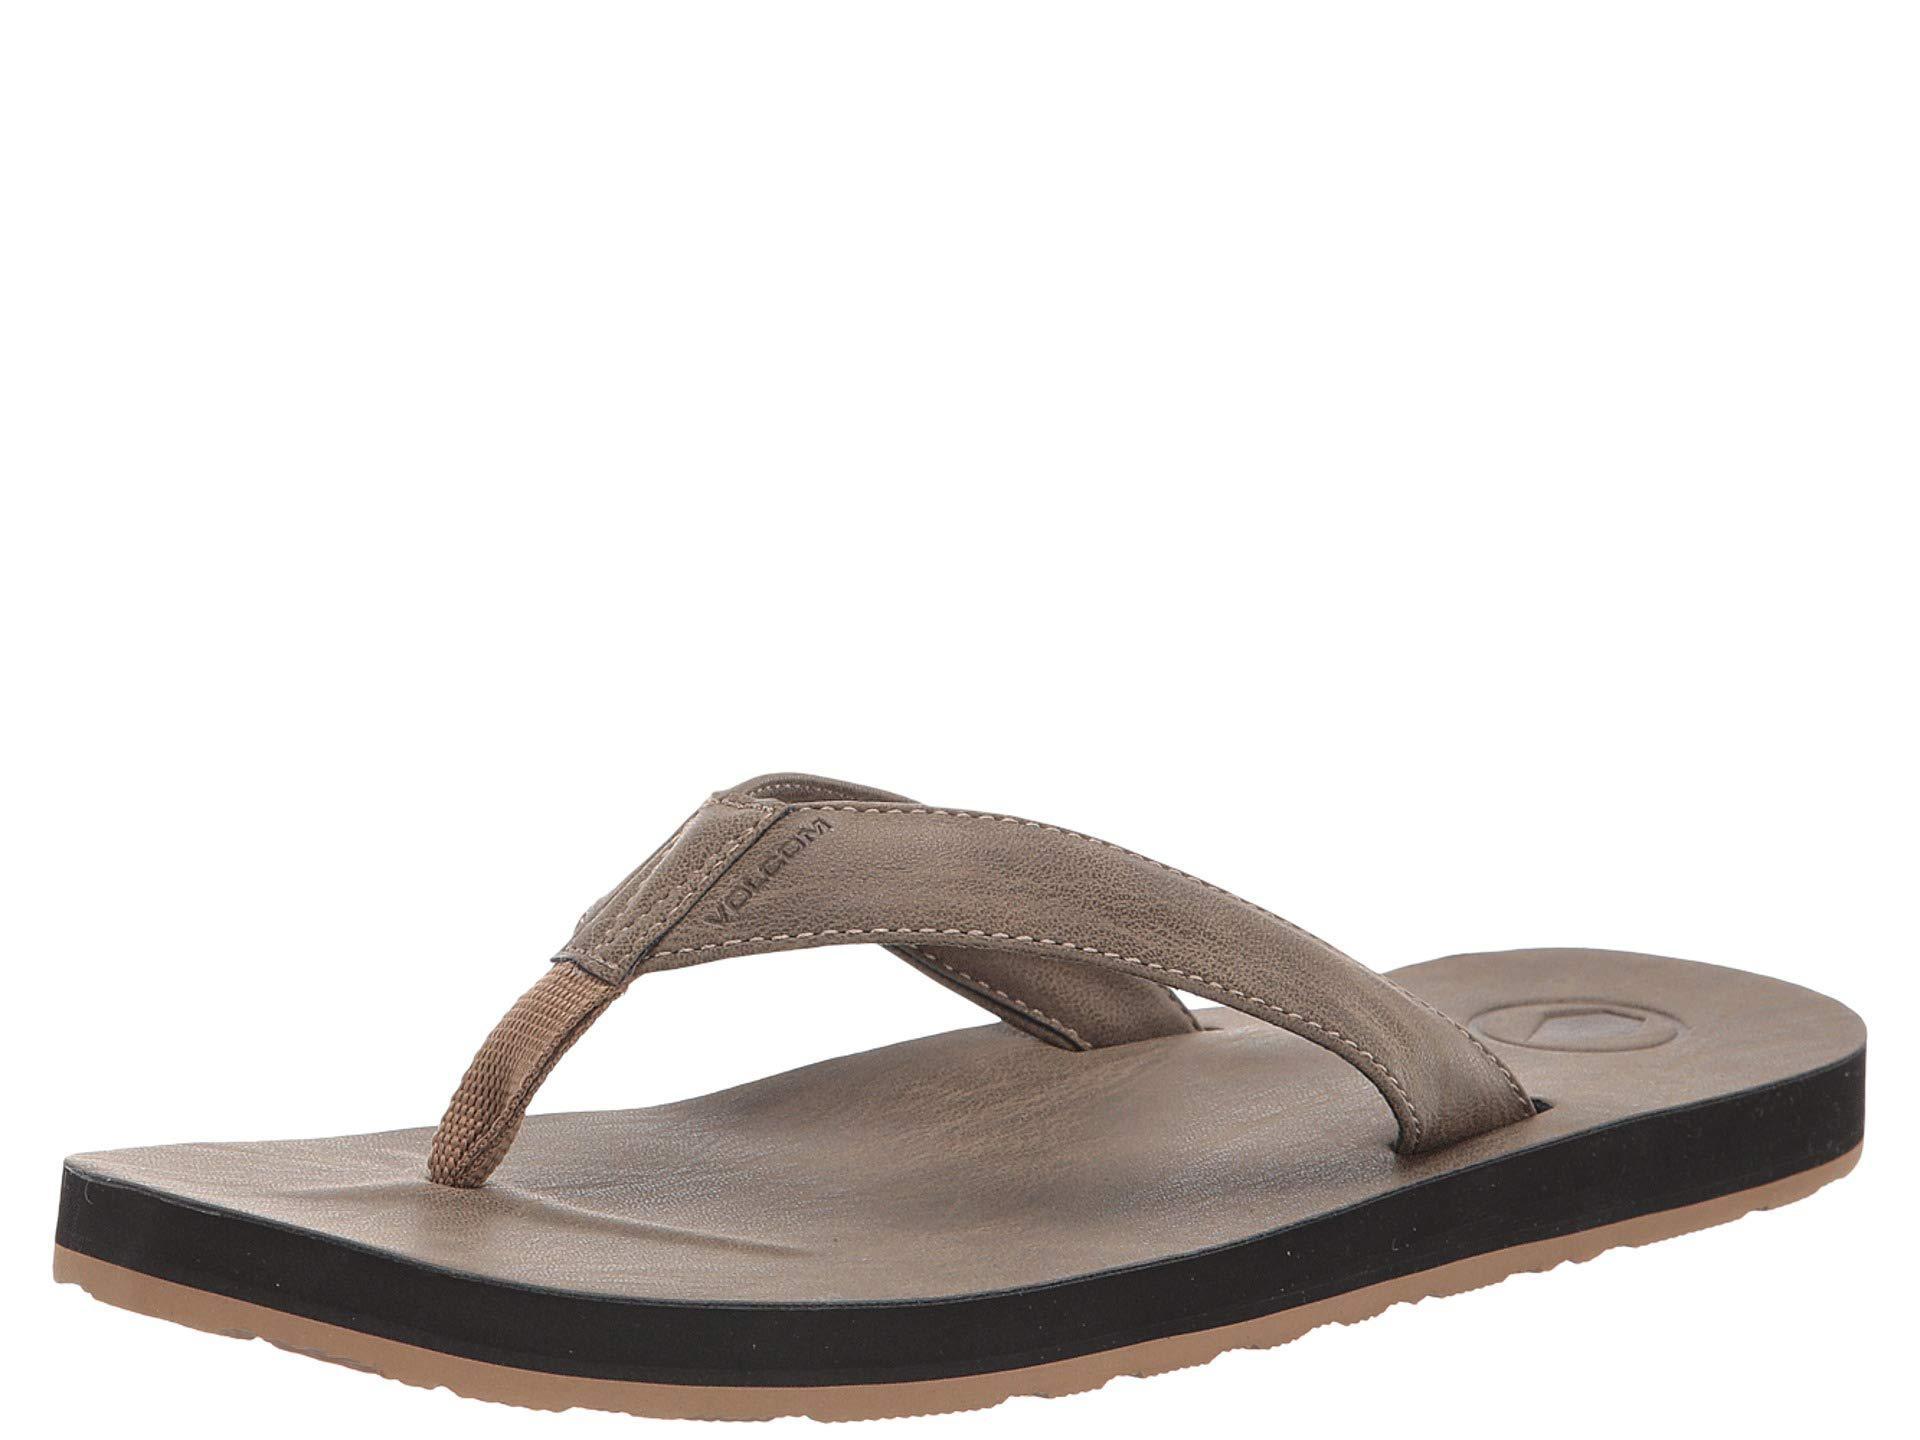 08e5fe1db33cf Volcom - Brown Fathom Sandal (black) Men s Shoes for Men - Lyst. View  fullscreen